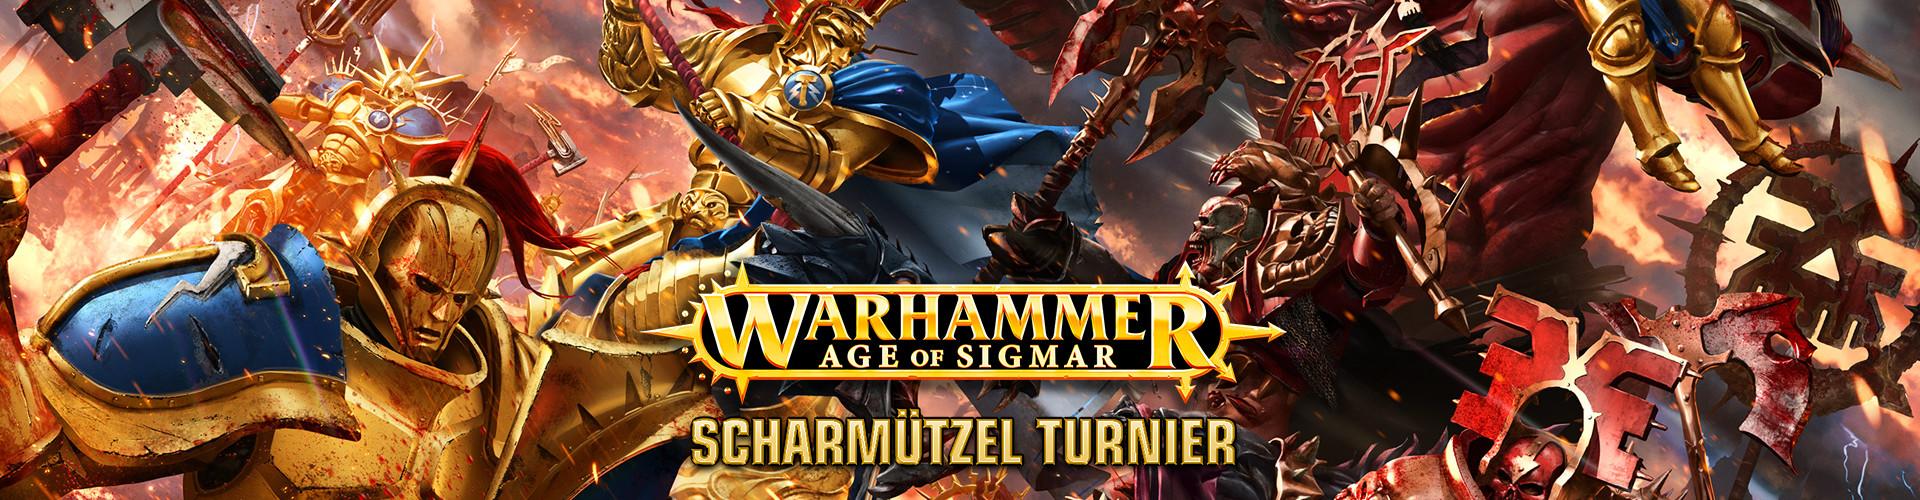 TNM 04 Age of sigma scharmuetzel - Turnier: WARHAMMER Age of Sigmar